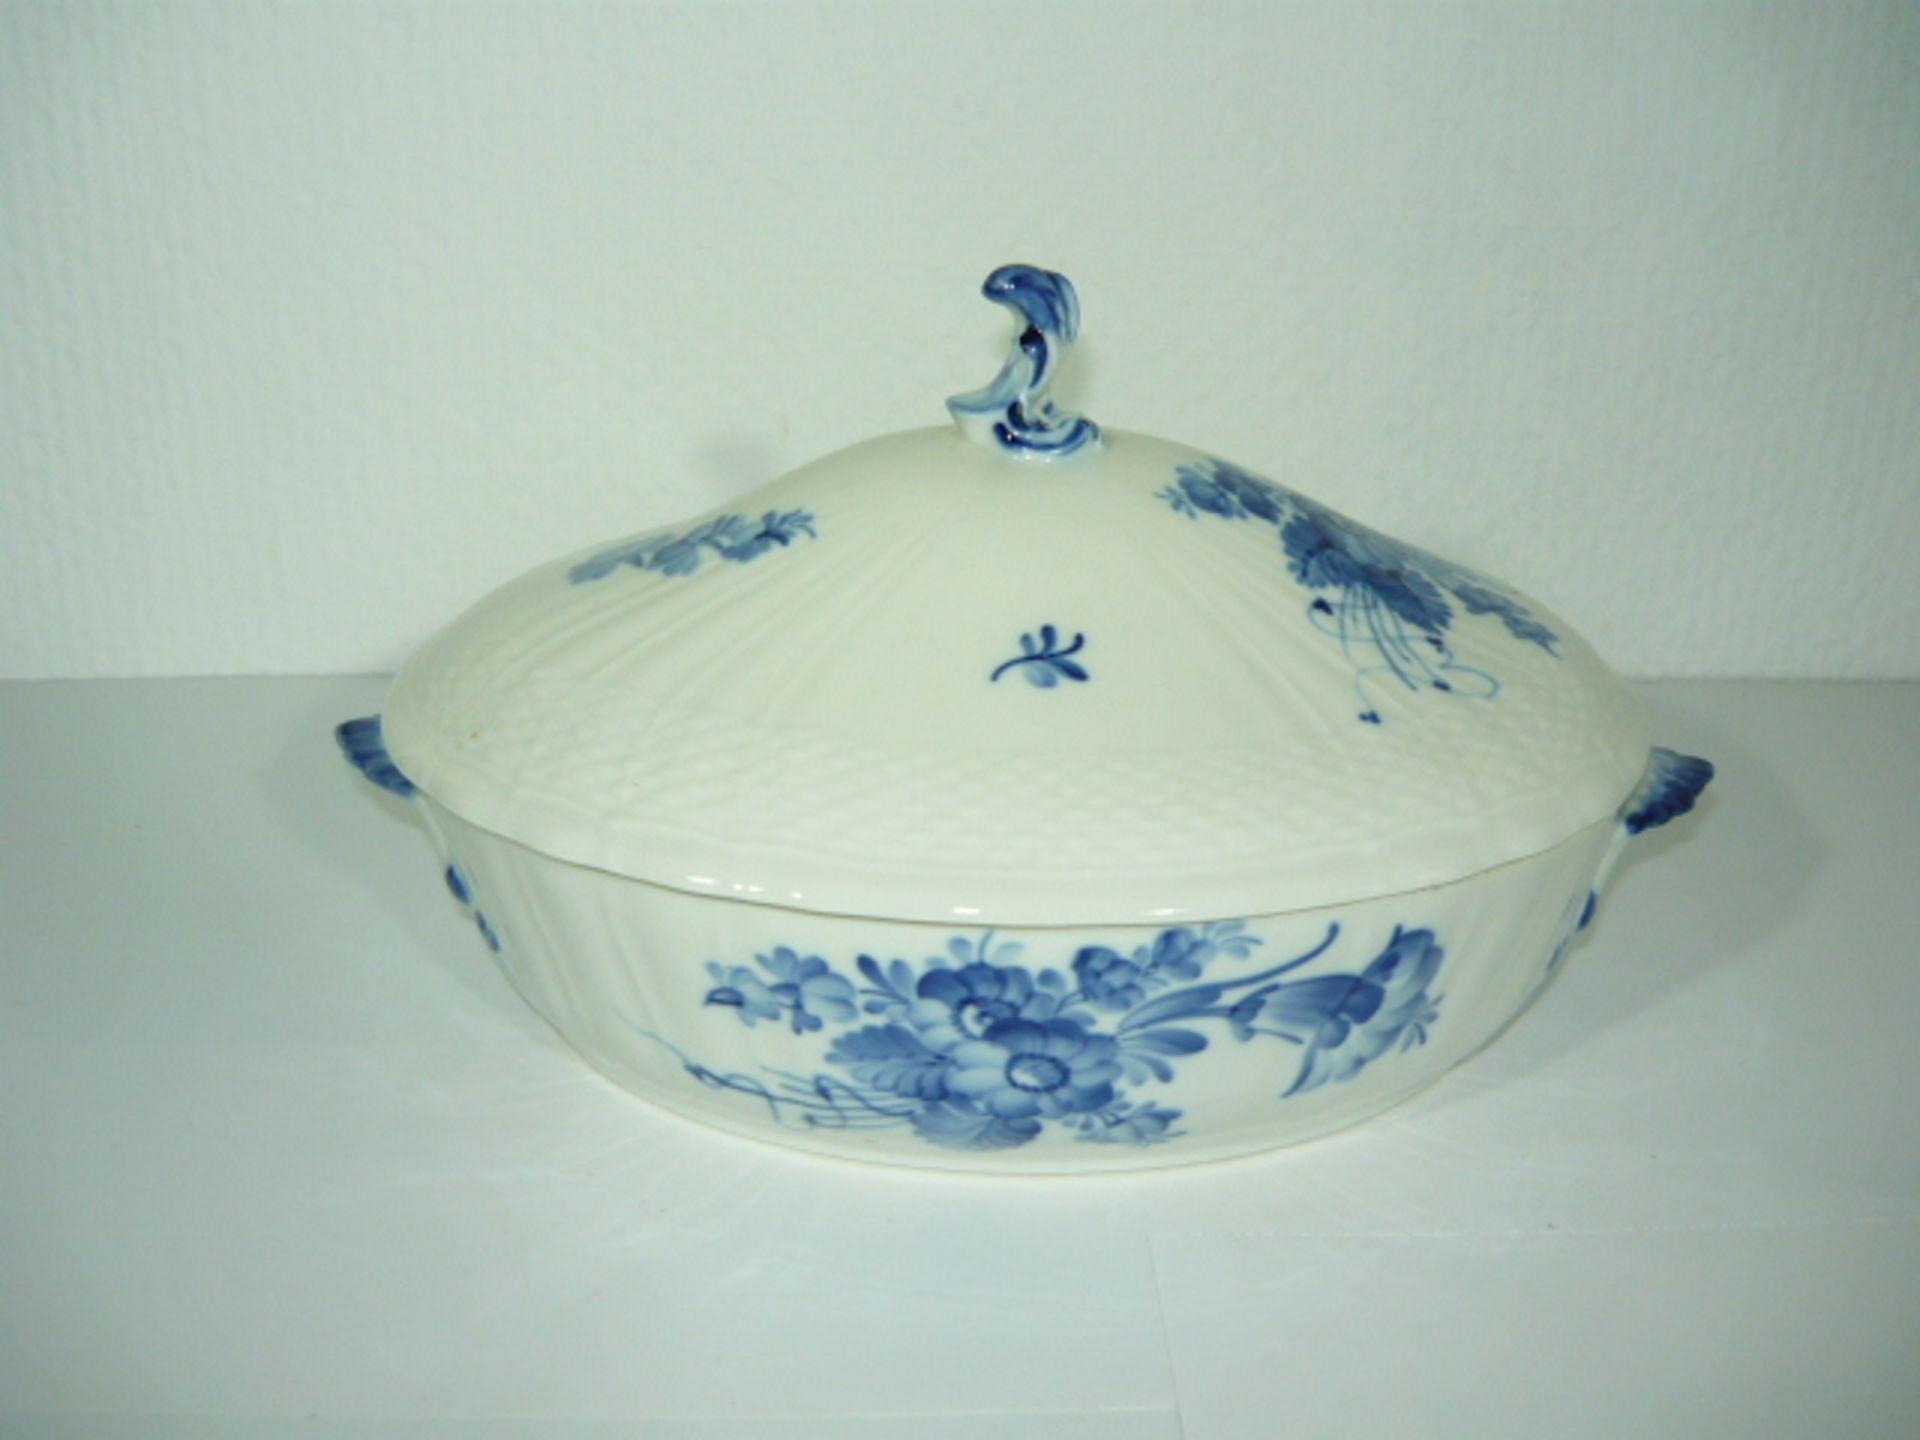 Royal Copenhagen. Blaue Blume. Ovale Deckelschüssel. II.W. L. ca. 28cm. KOSTENLOSER VERSAND